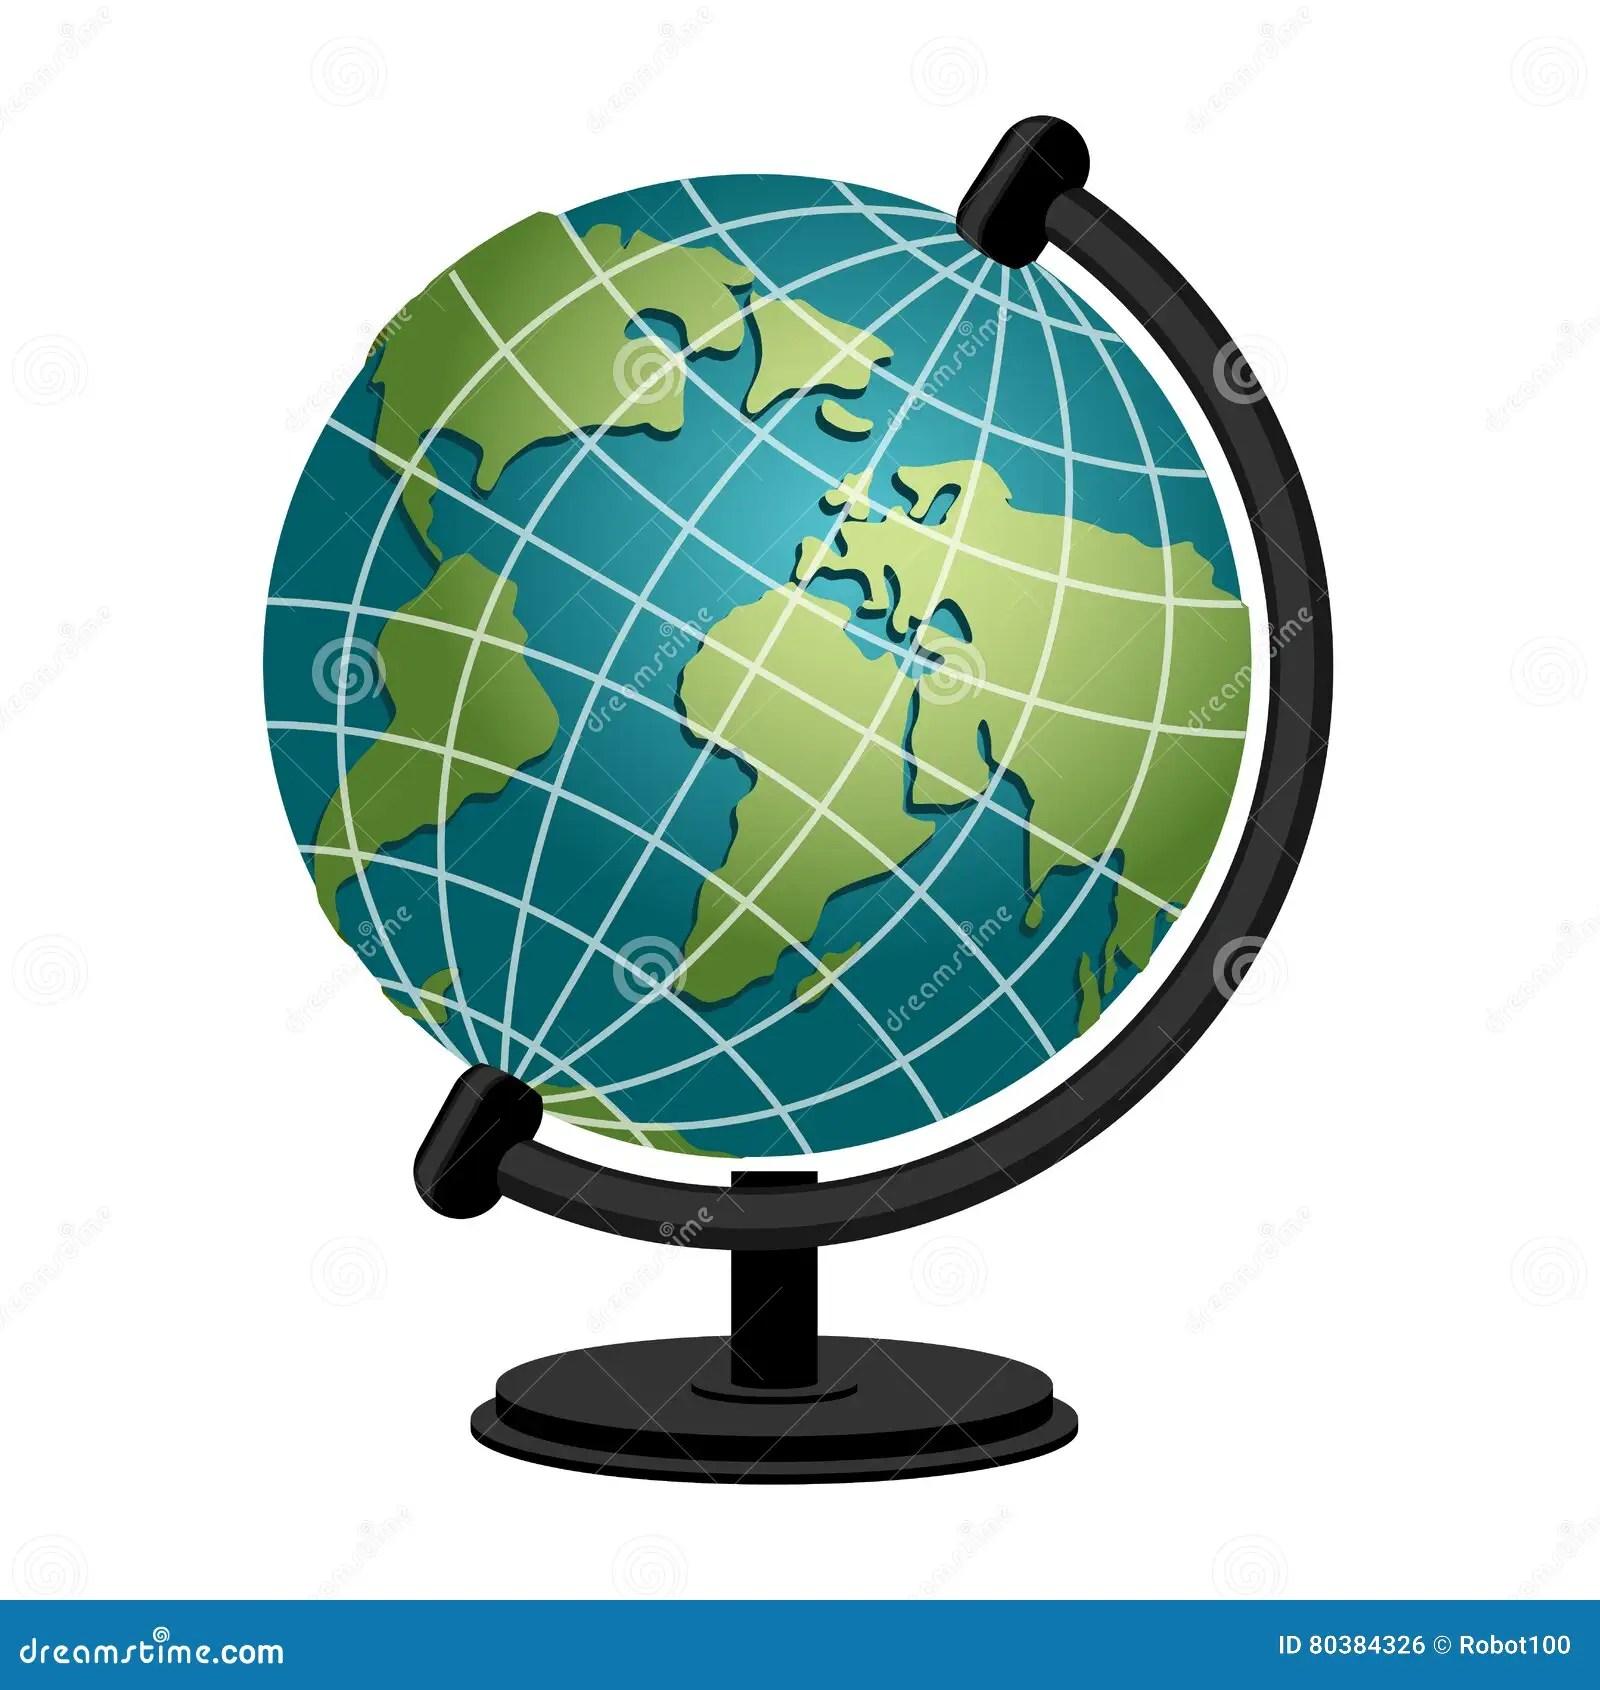 Earth School Geography Globe Model Of Planet Sphere